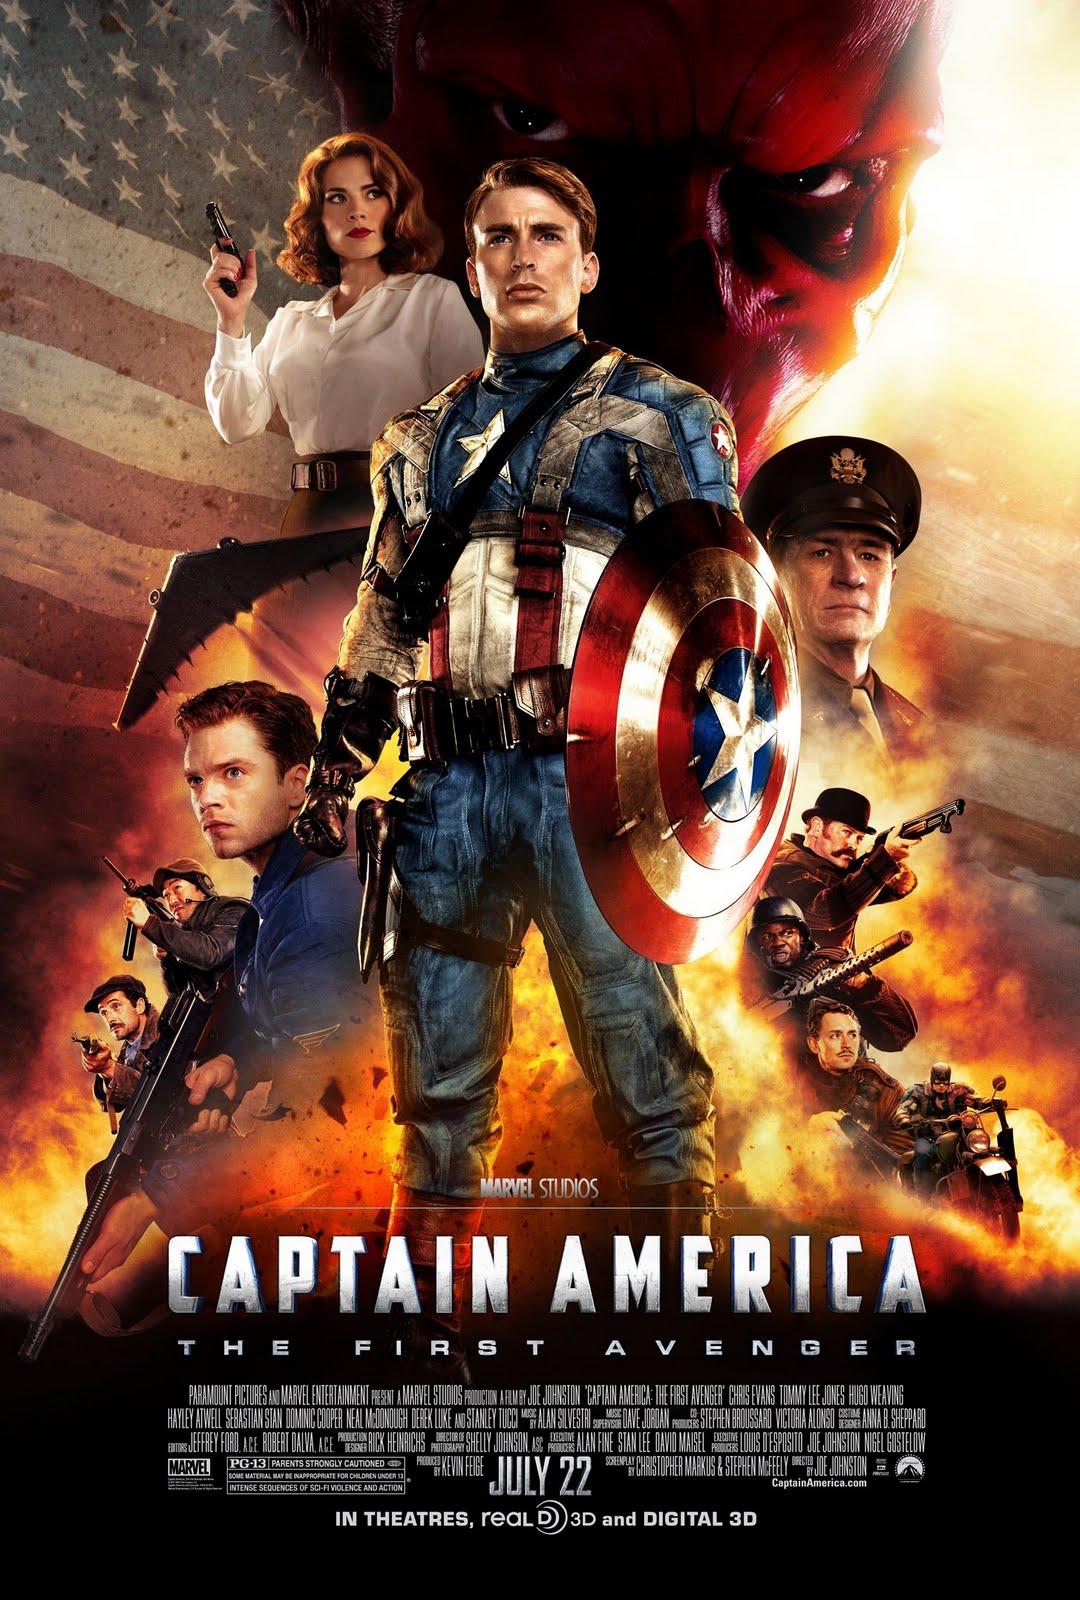 http://4.bp.blogspot.com/-BFXhNzMs7zo/Tl8mzLwFHlI/AAAAAAAAAD0/Jd1QQfwdkBM/s1600/Captain+America+The+First+Avenger.jpg